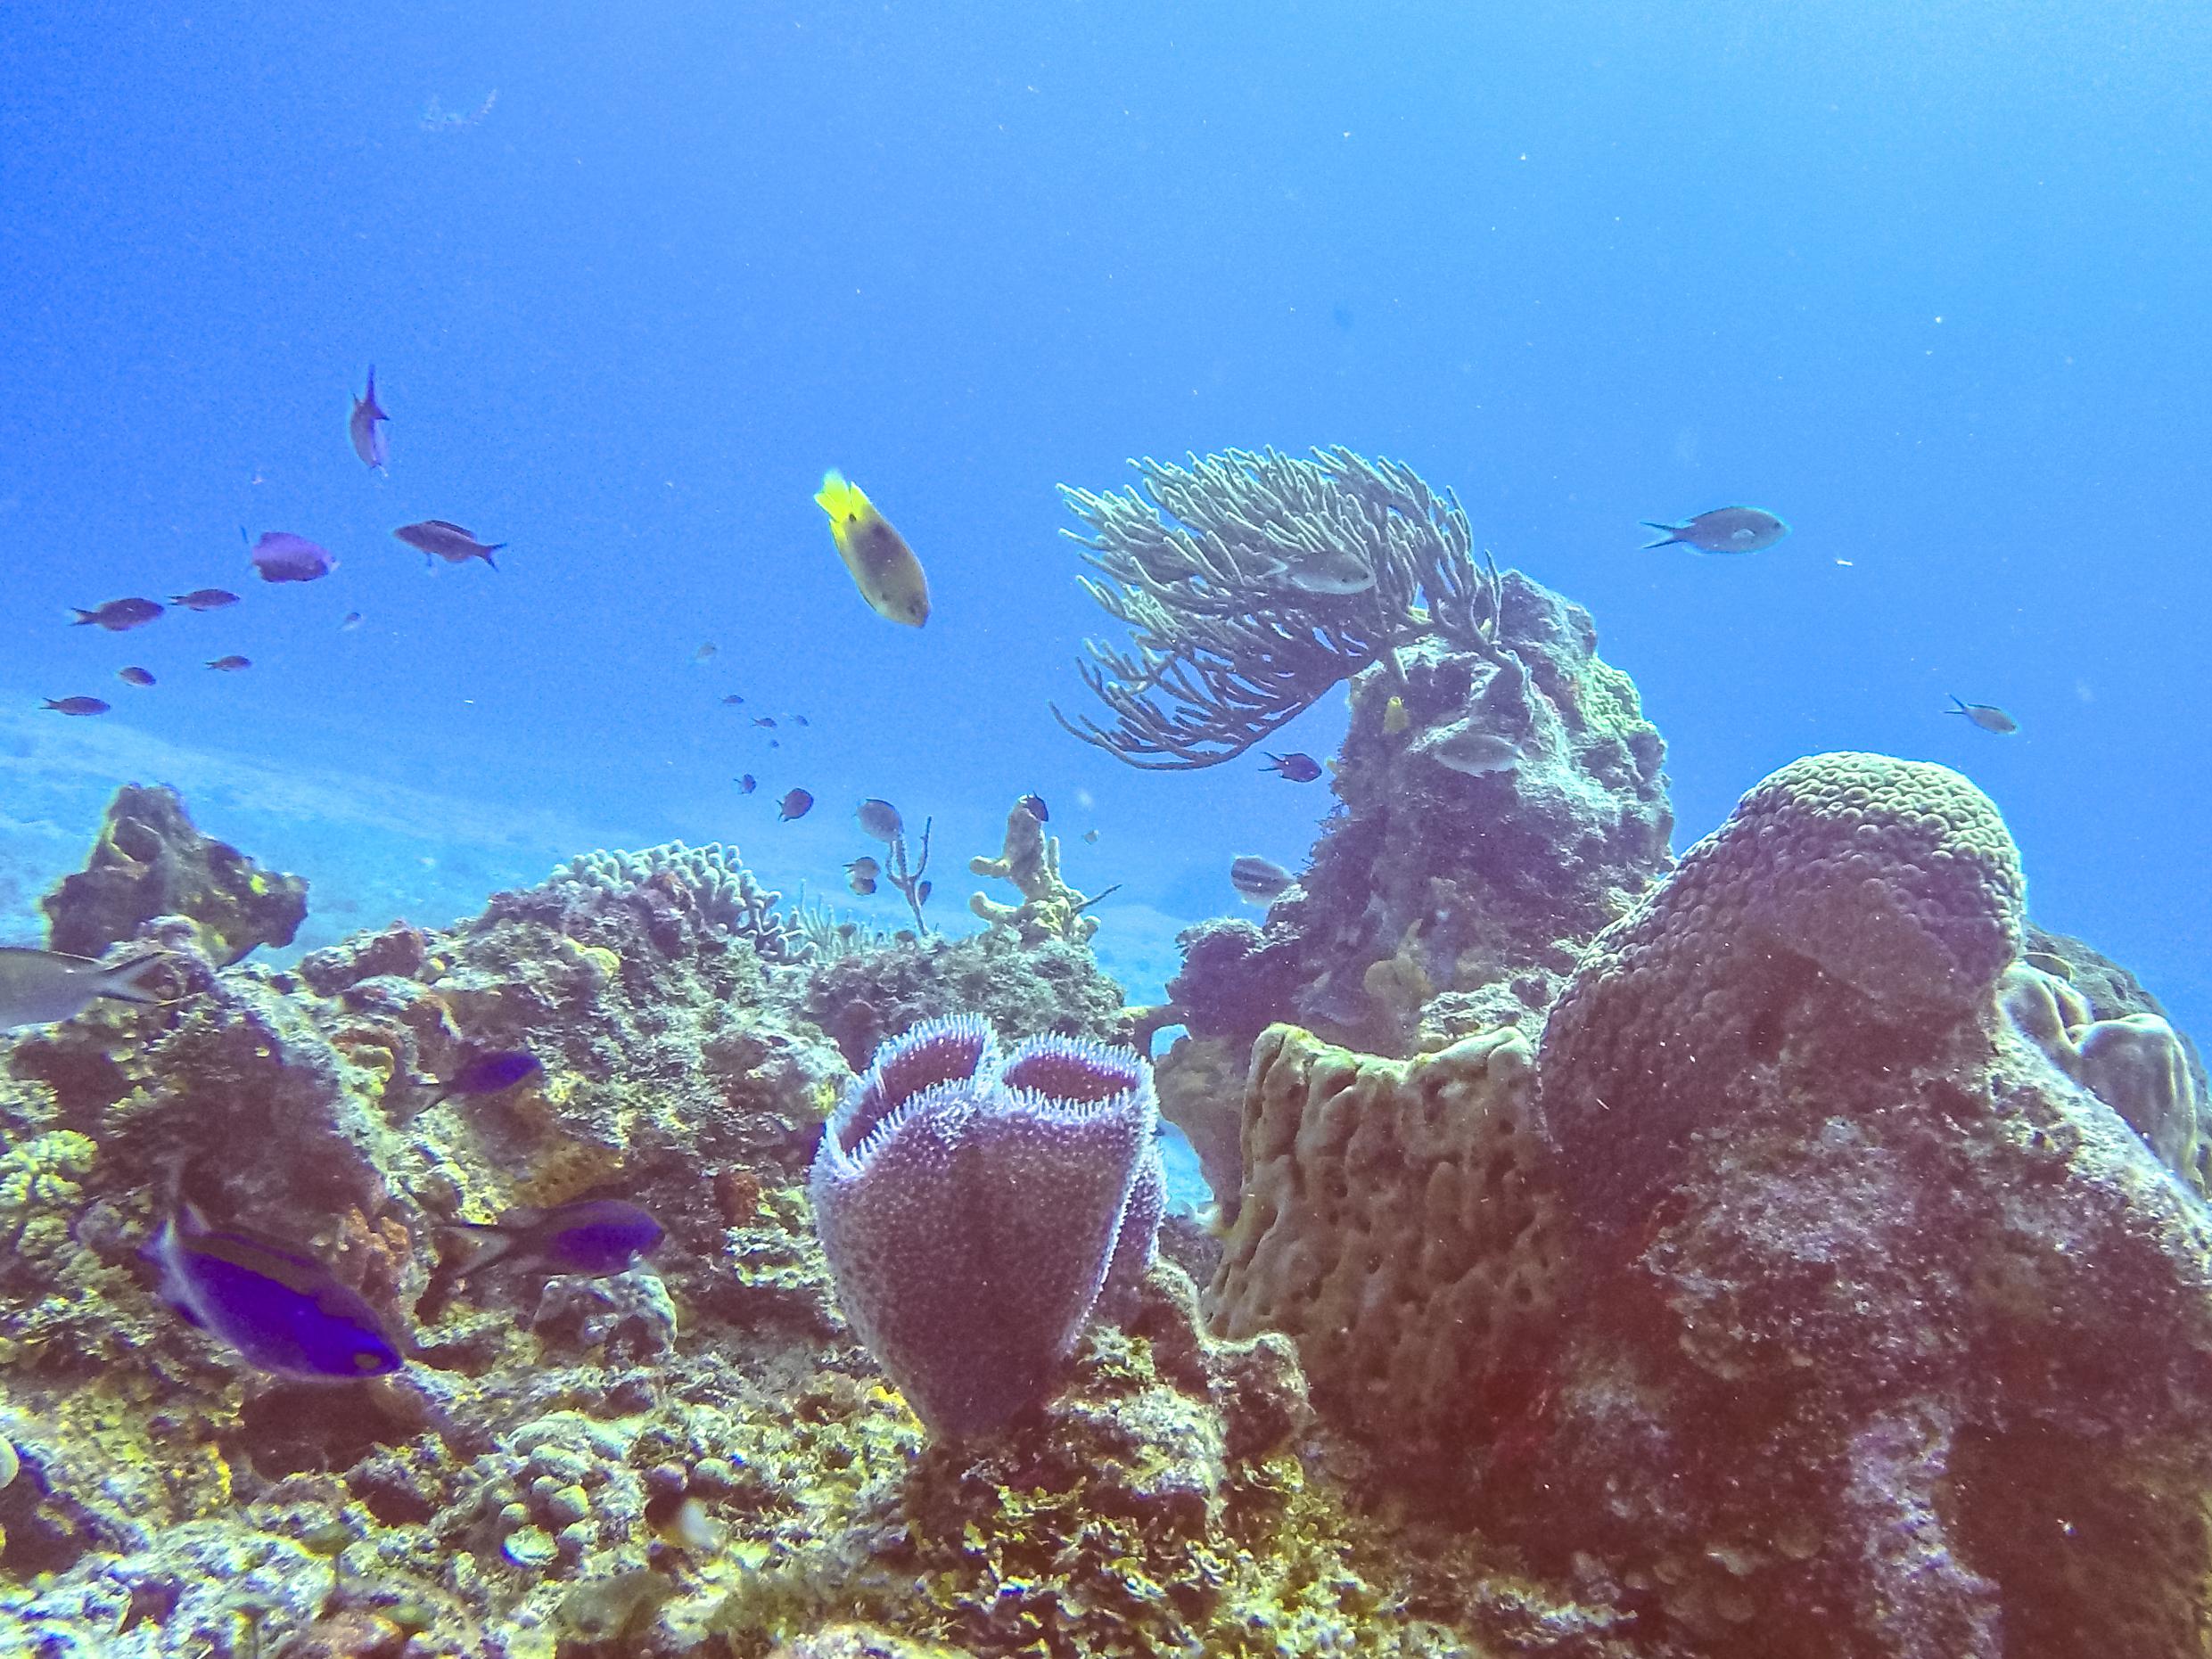 Arrecifes en la isla de Cozumel